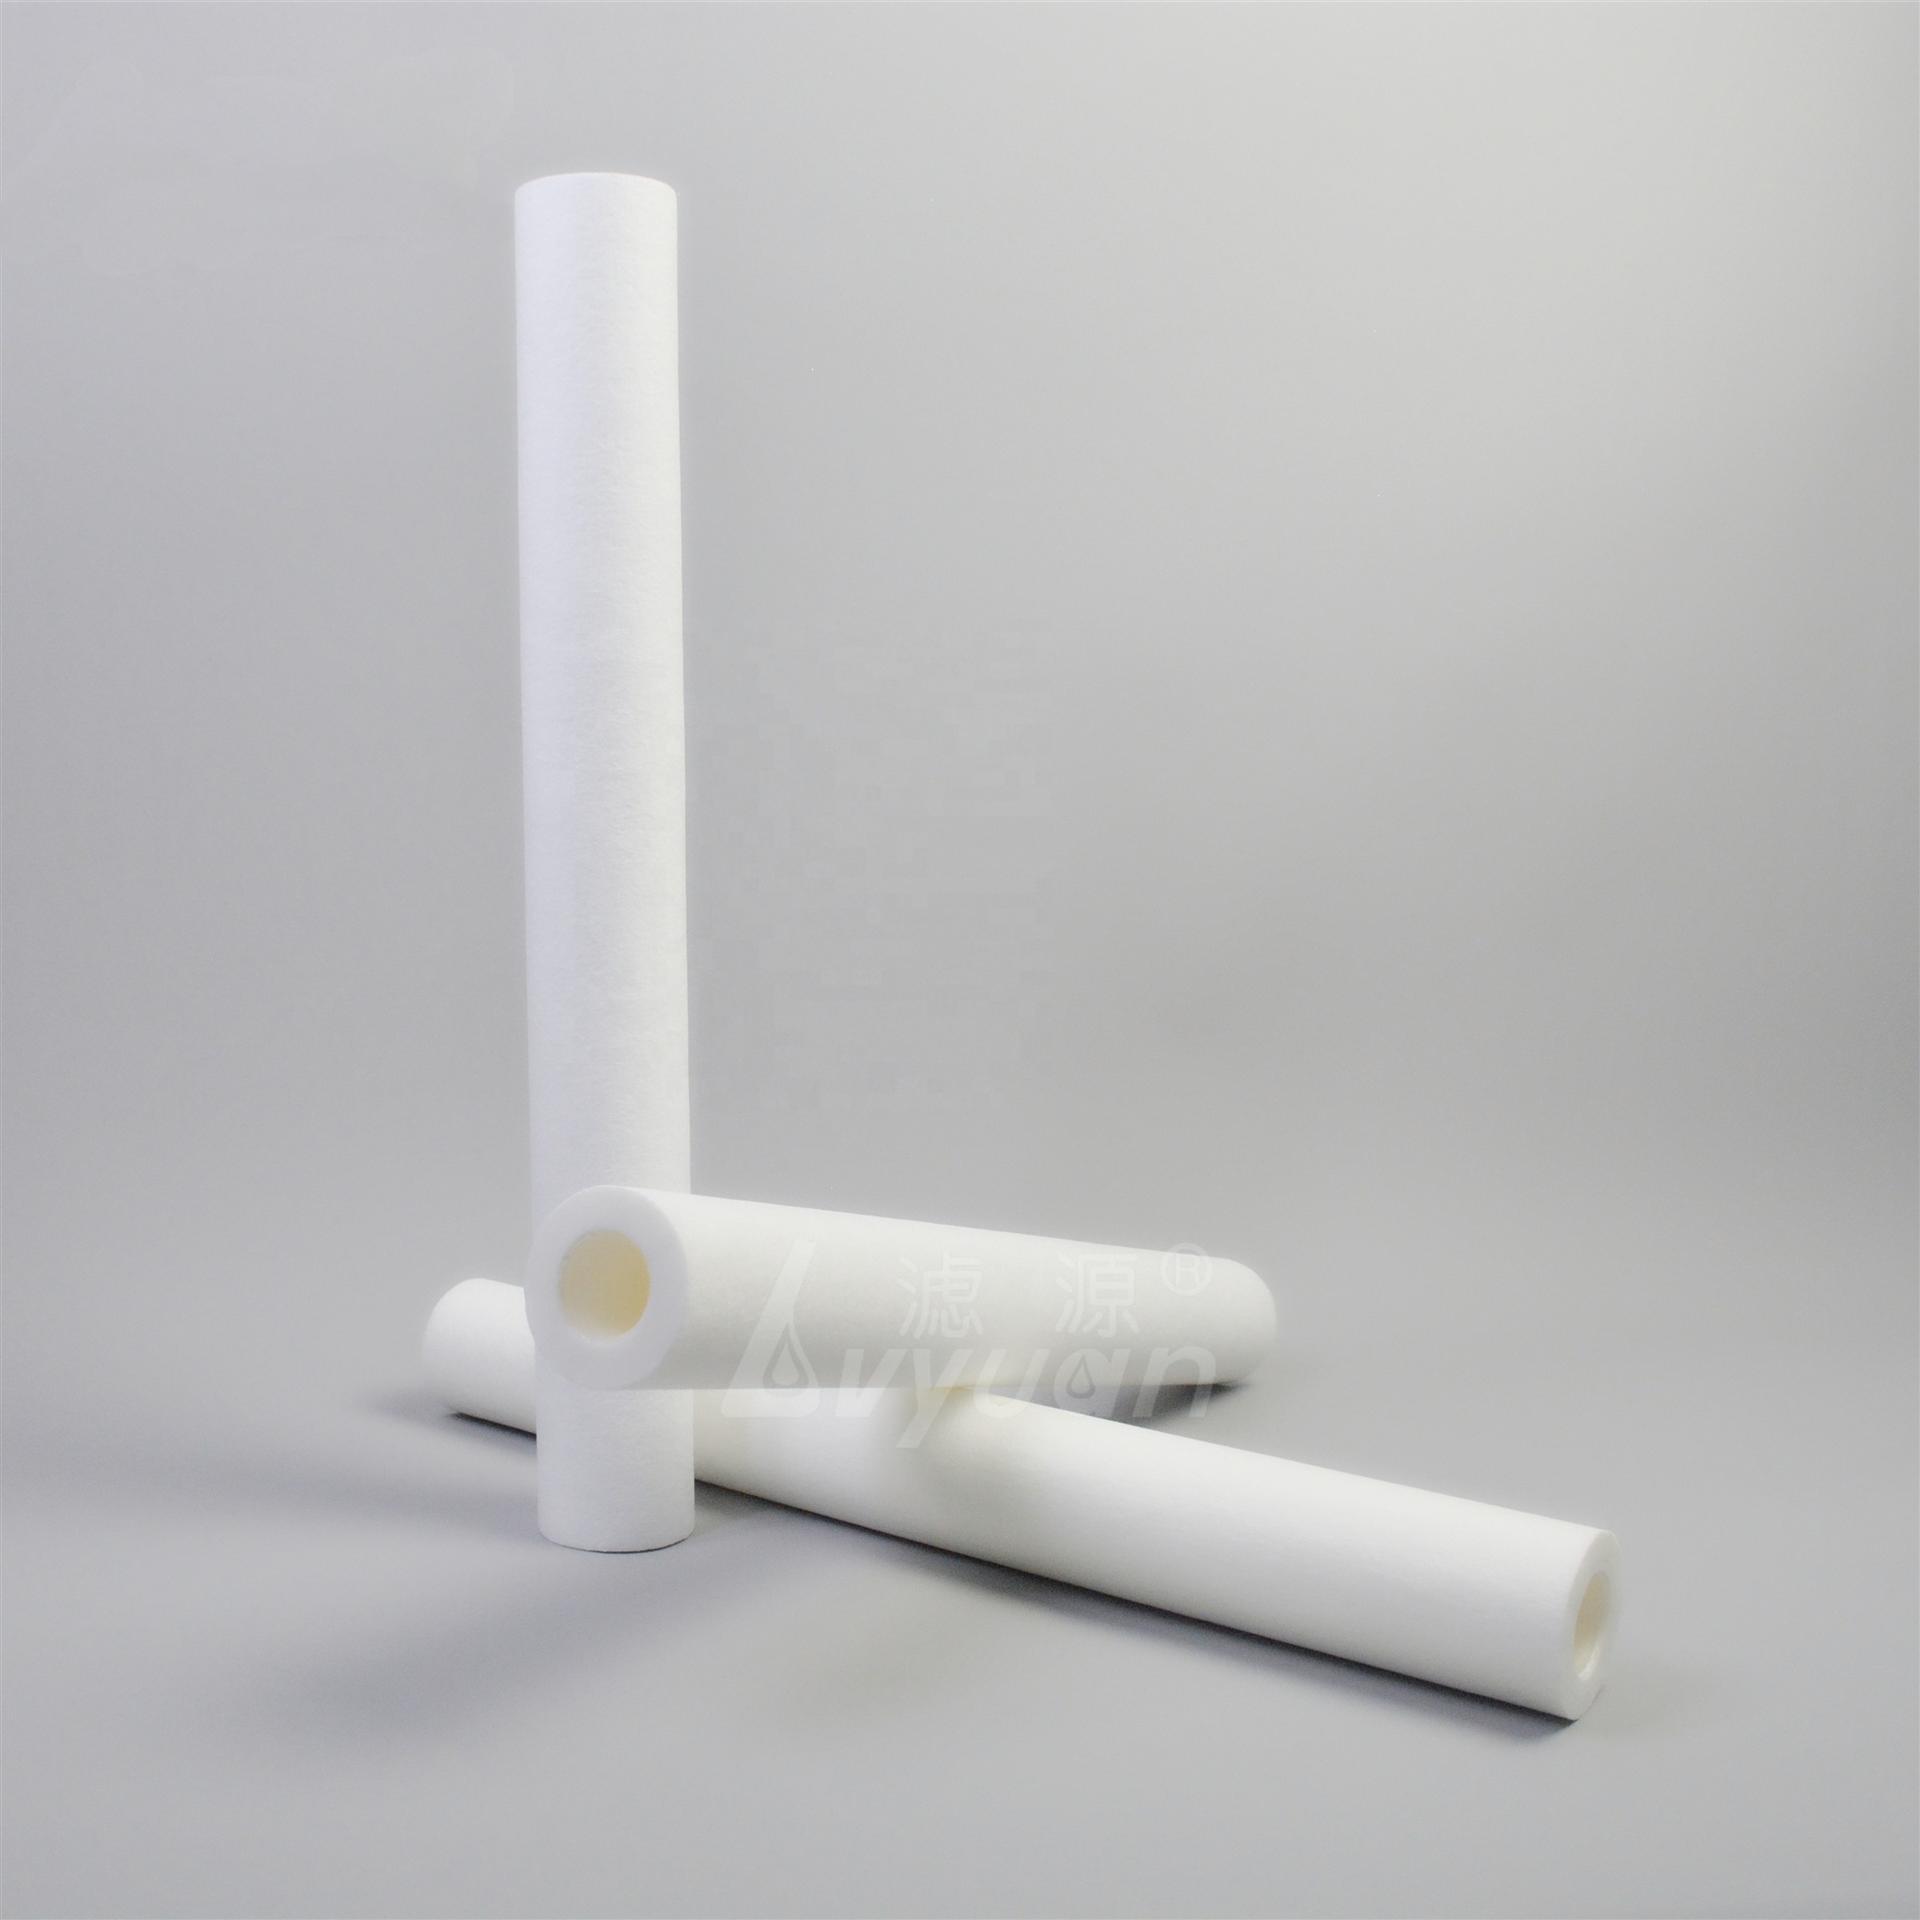 discount price 20inch flat DOE pp melt blown filter /pp water filter cartridge 1 box /25/pcs